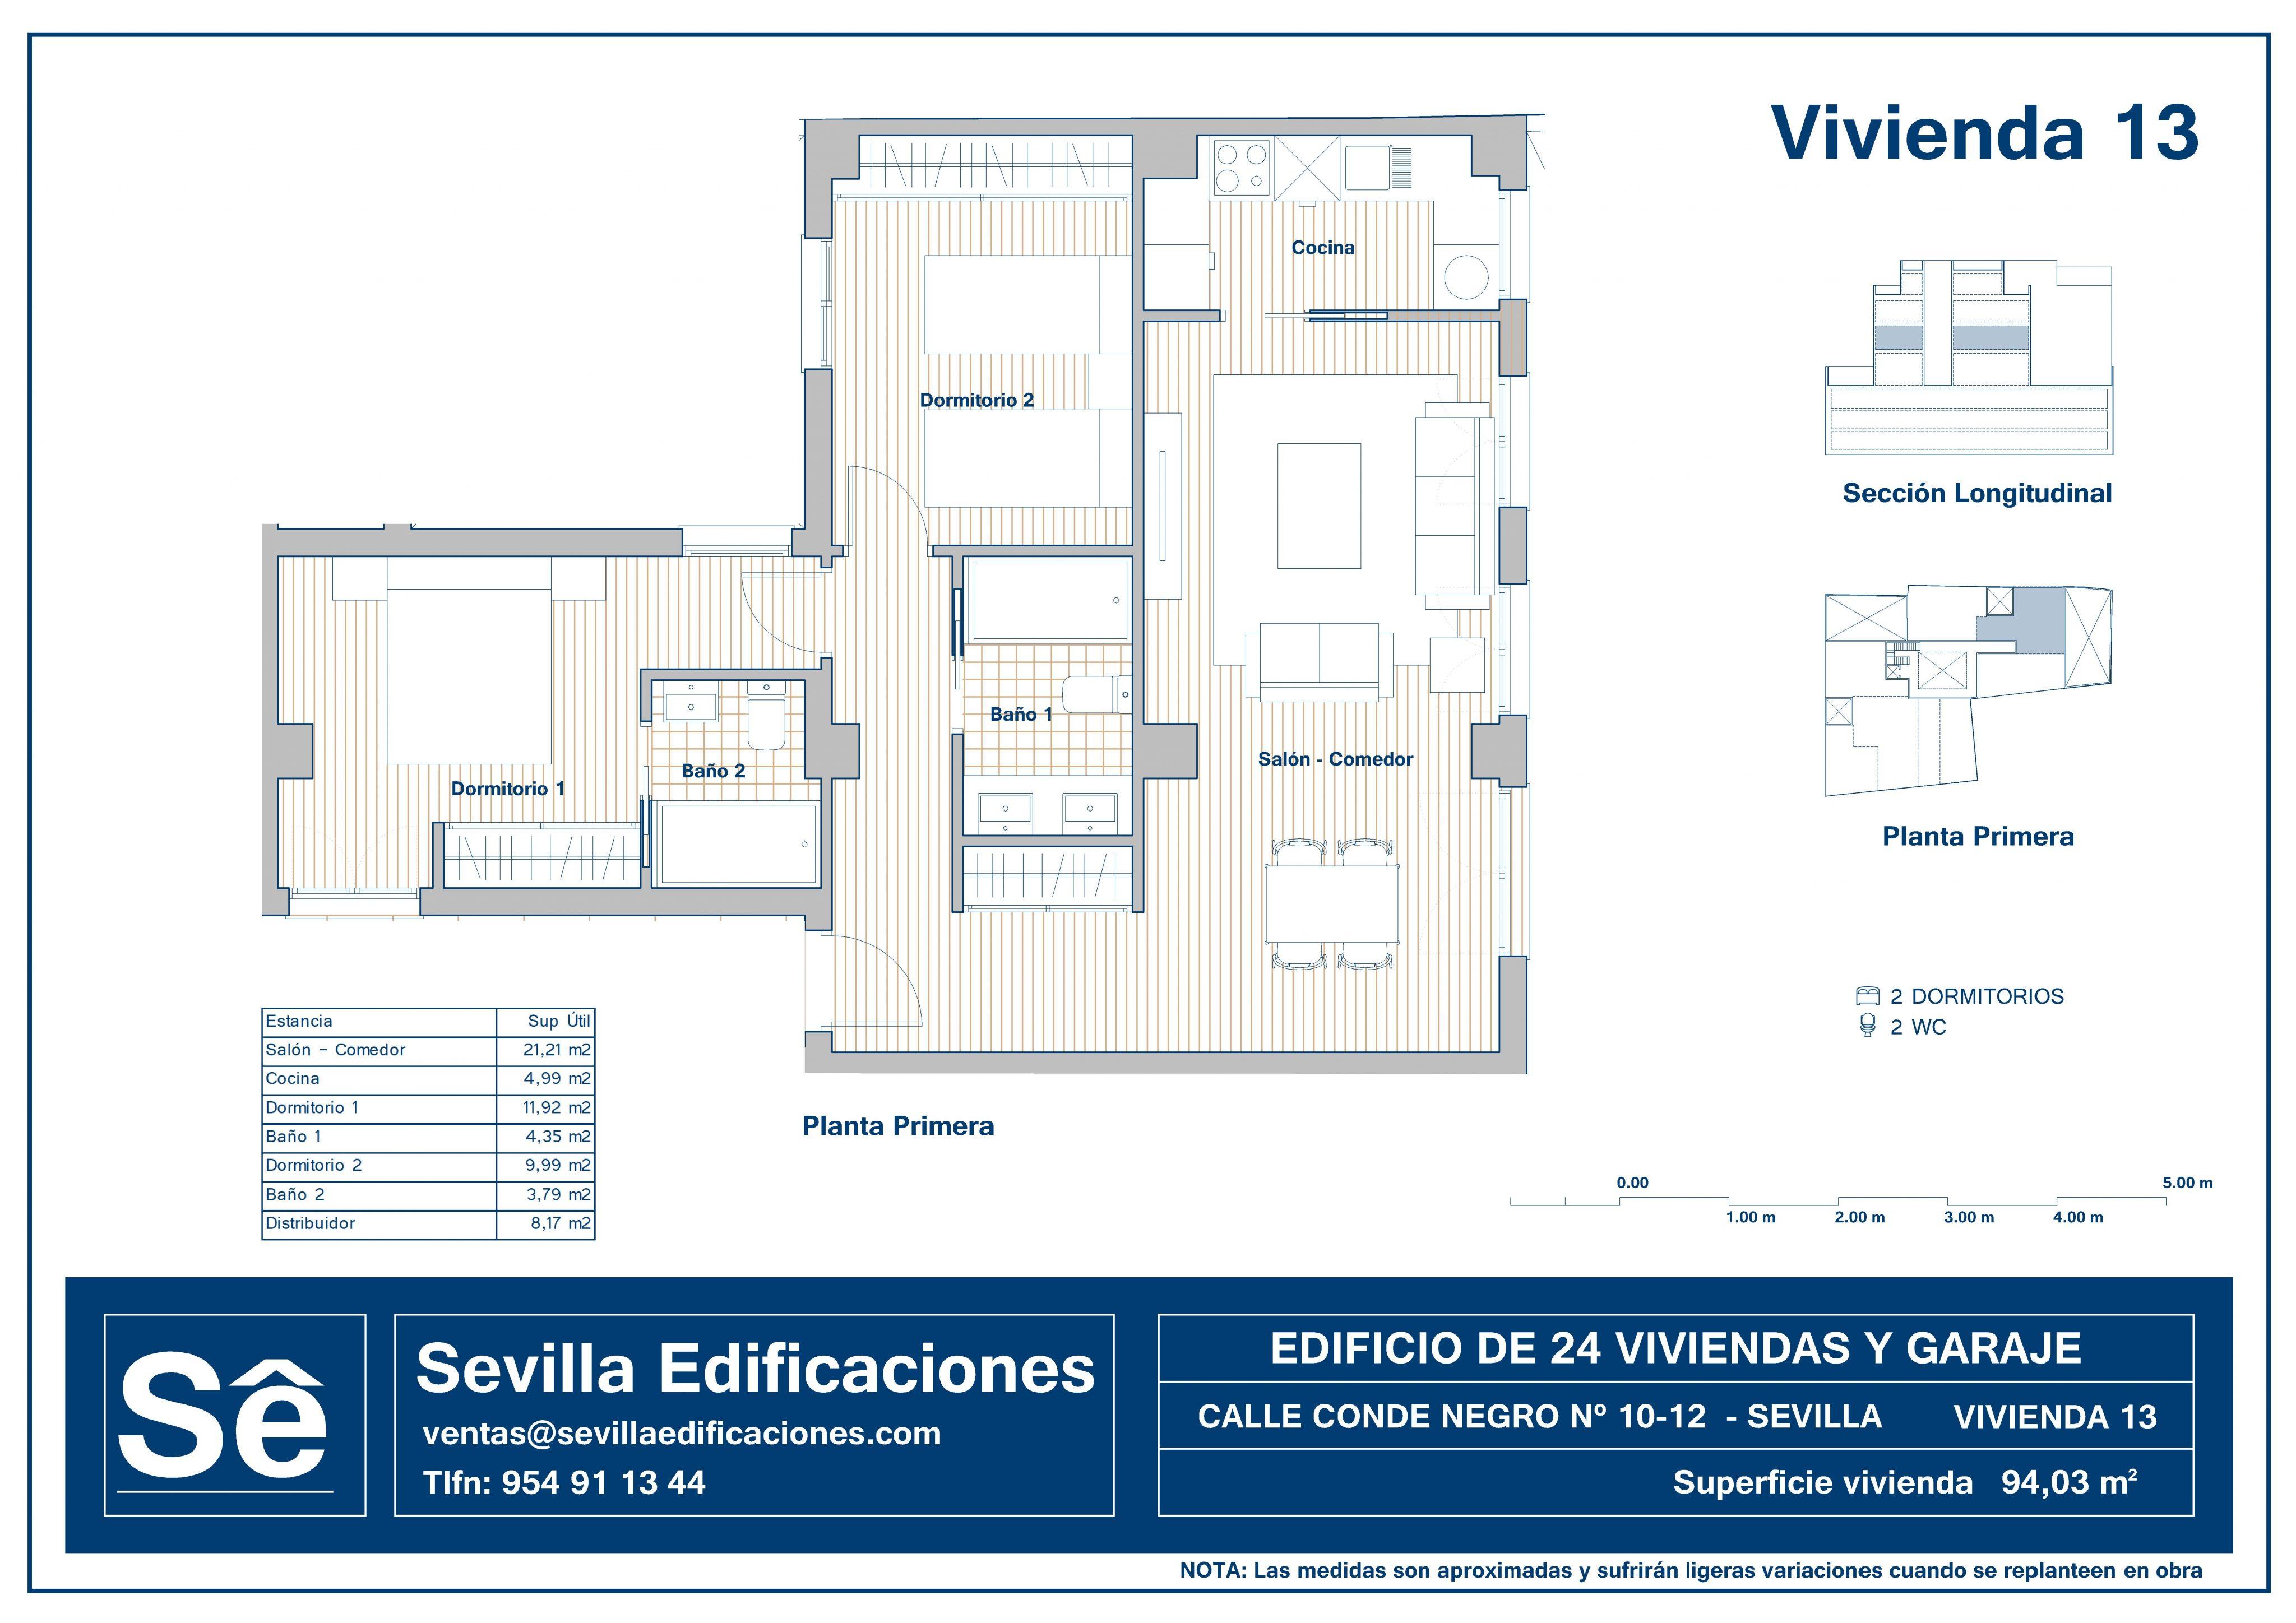 CONDENEGRO_VIVIENDA_13